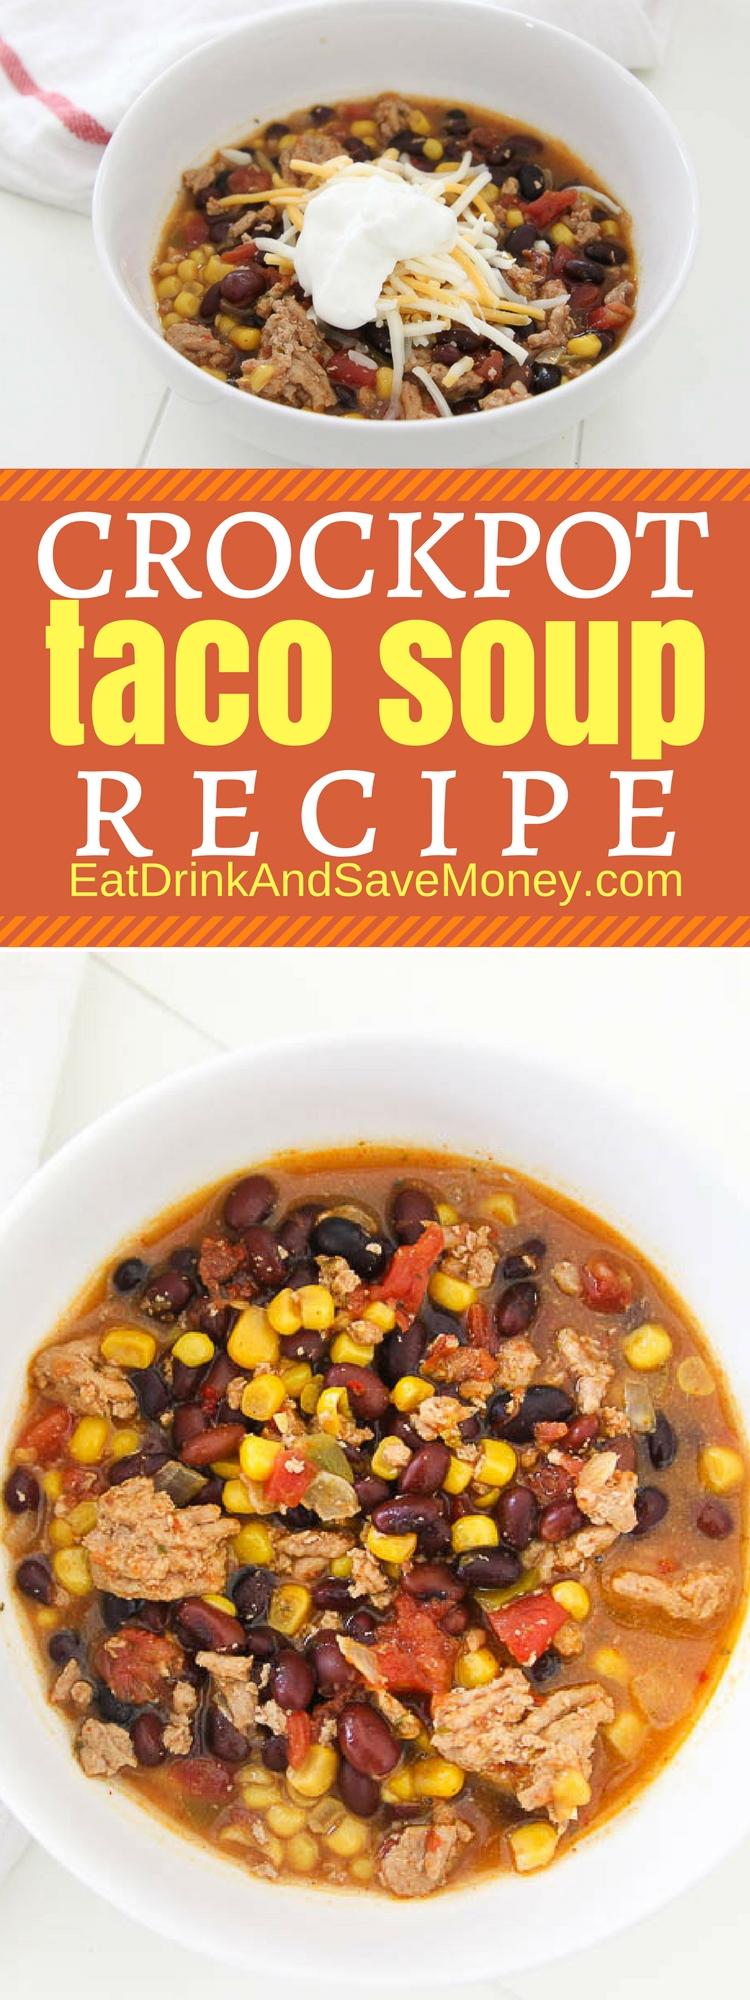 Crockpot Taco Soup Recipe | easy dinner recipe #crockpot #soup #dinner #recipe #dinner